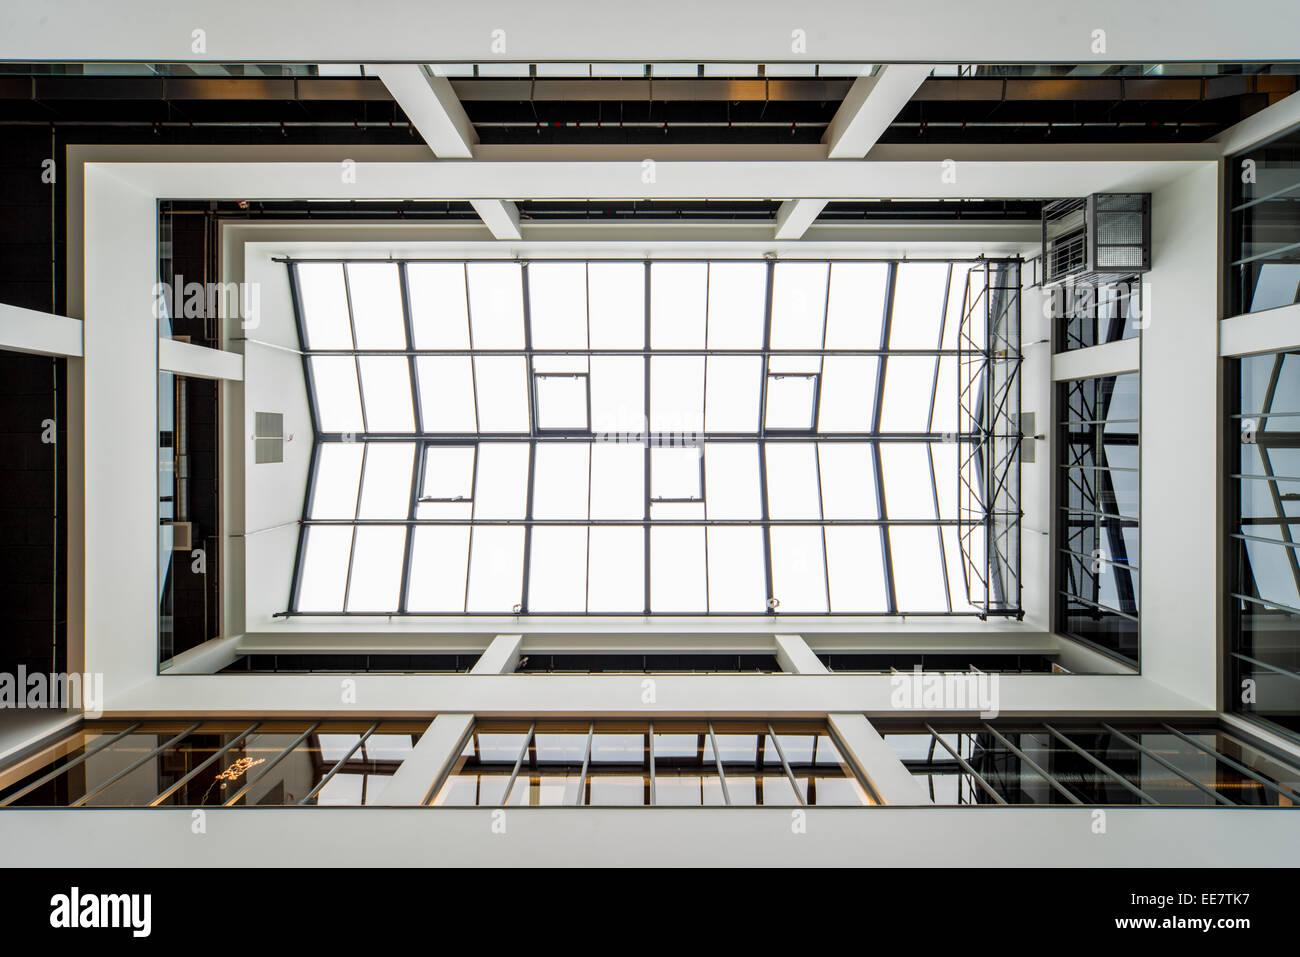 Fantastisch Metallrahmen Gebäuden Ideen - Rahmen Ideen ...